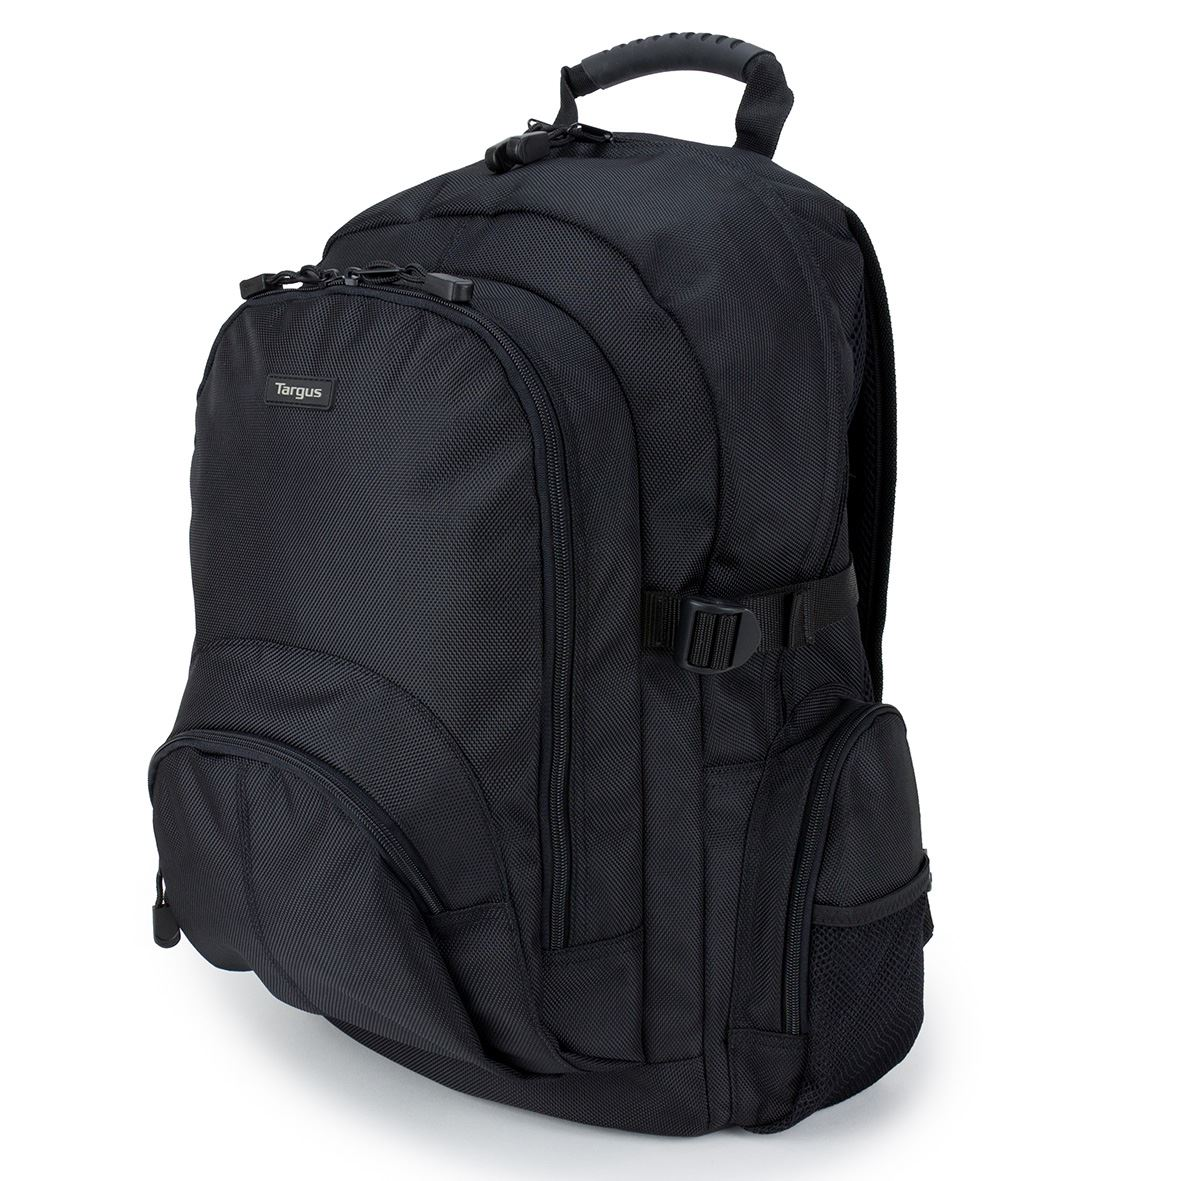 "Targus Sac a dos CN600 Classic 15.6"" Backpack Nylon Black (CN600) - Achat / Vente Sac et Sacoche sur Cybertek.fr - 1"